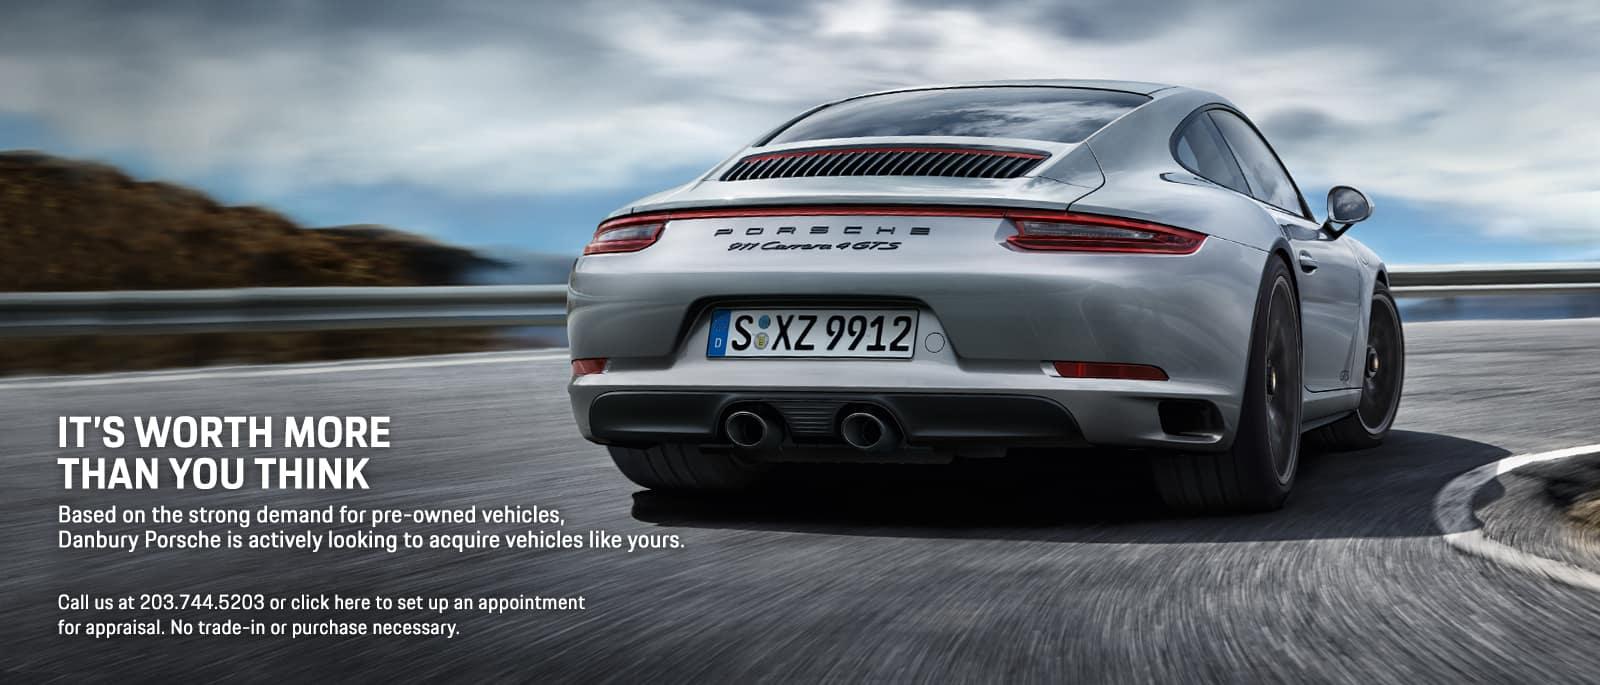 WAG180603_sld_MA1_C_Porsche